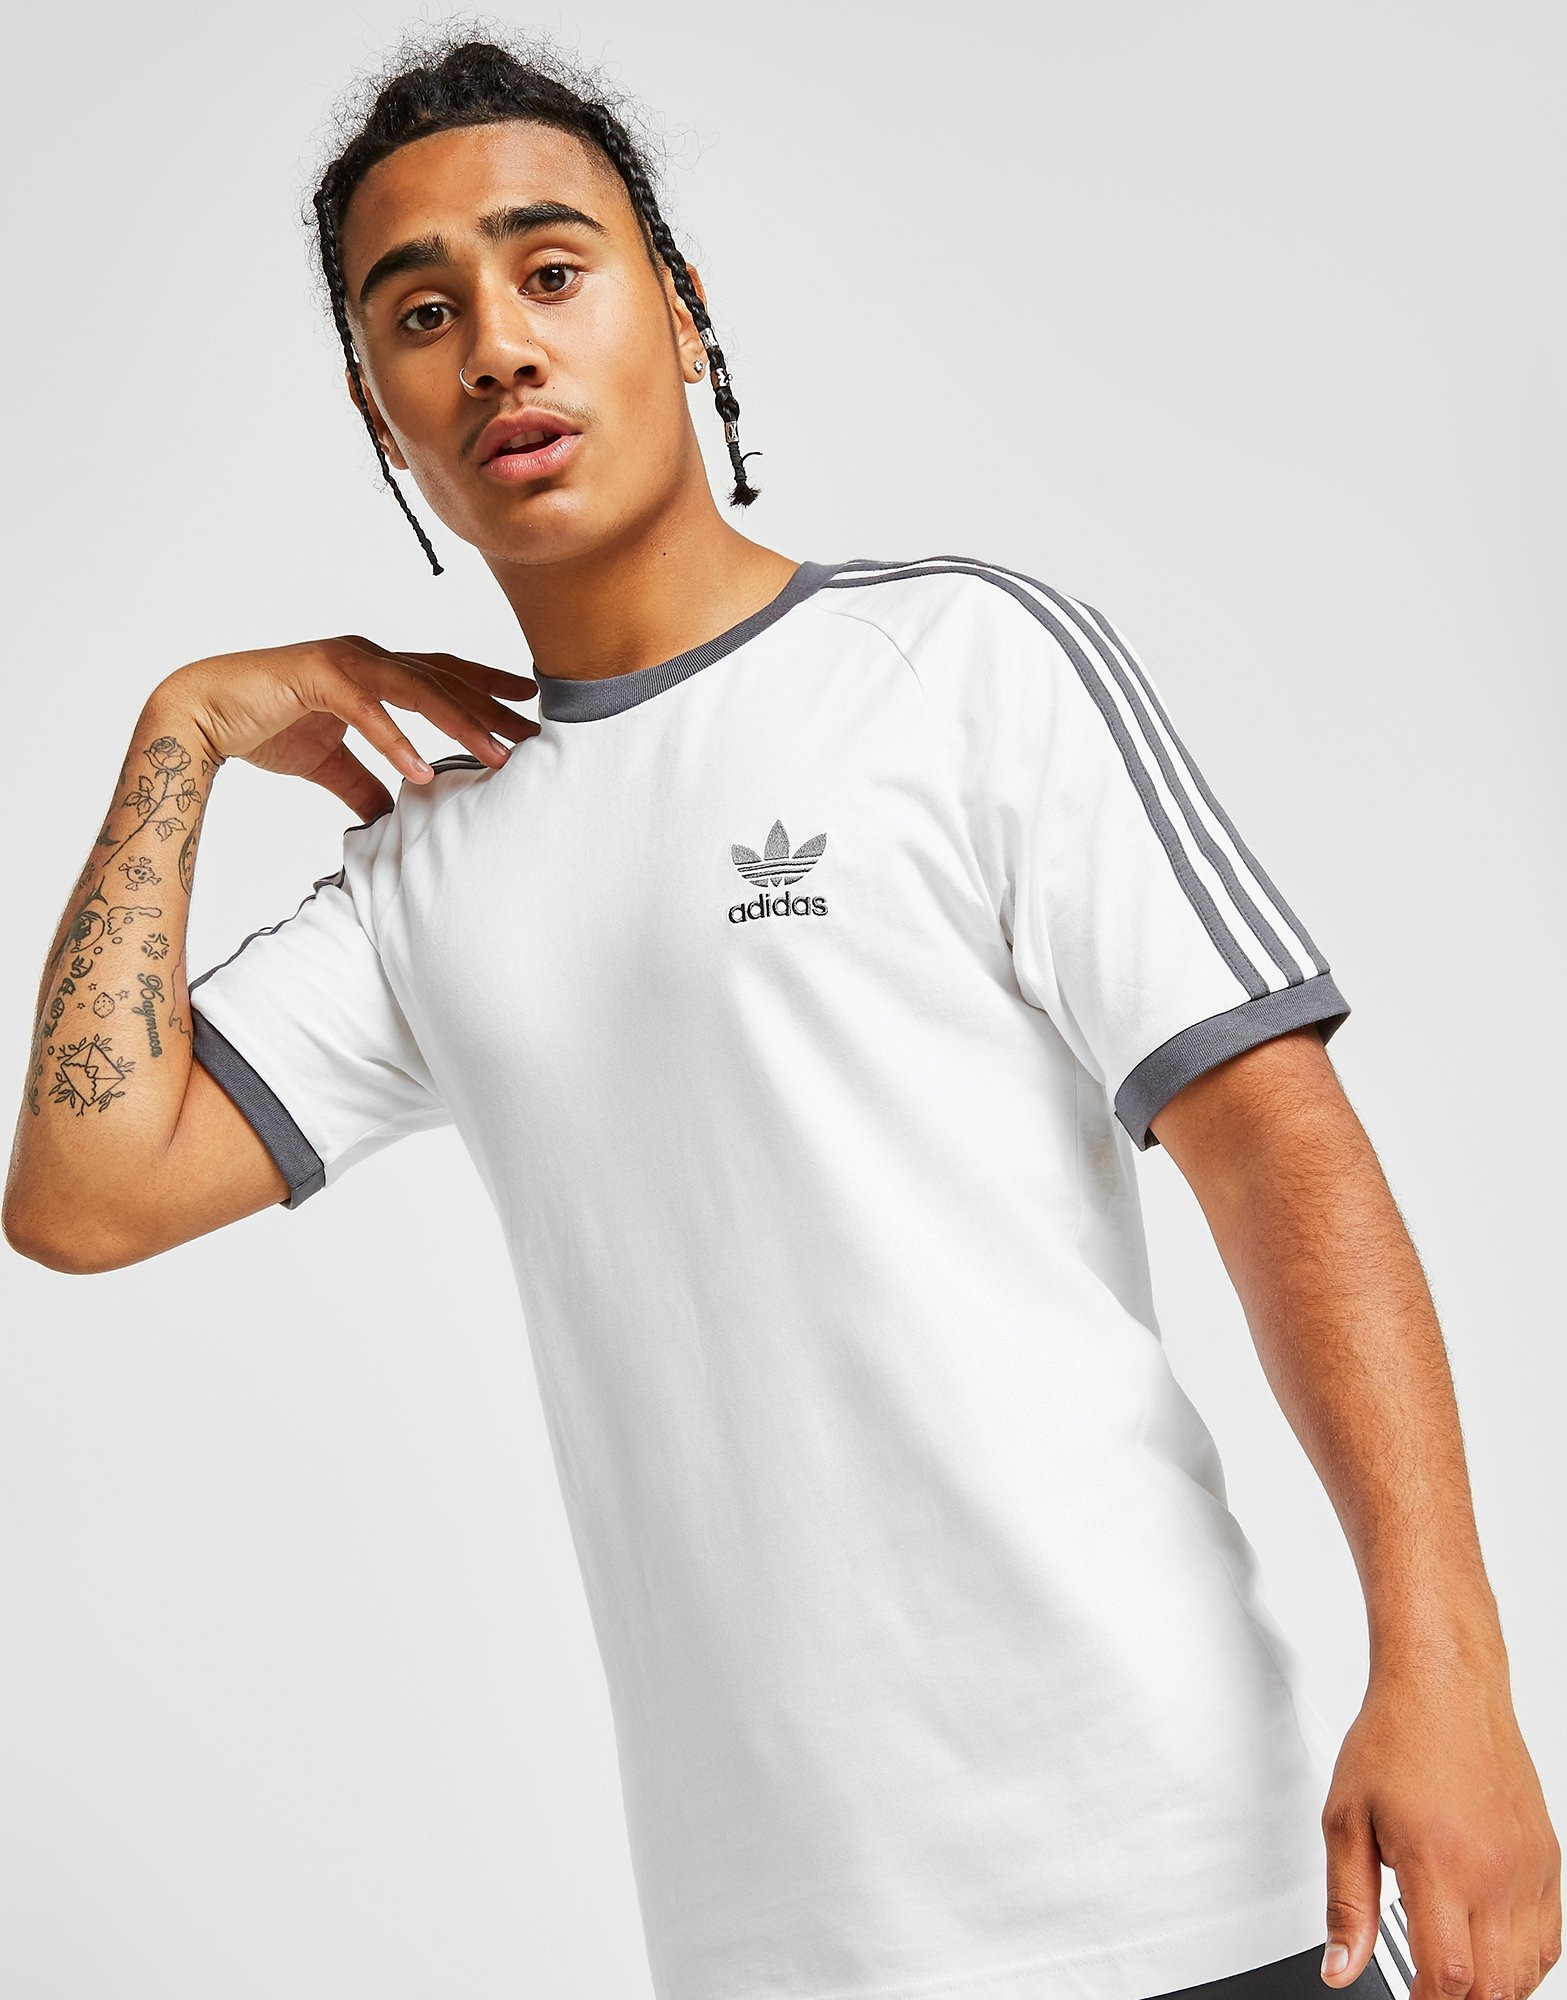 adidas california t shirt uomo bianca